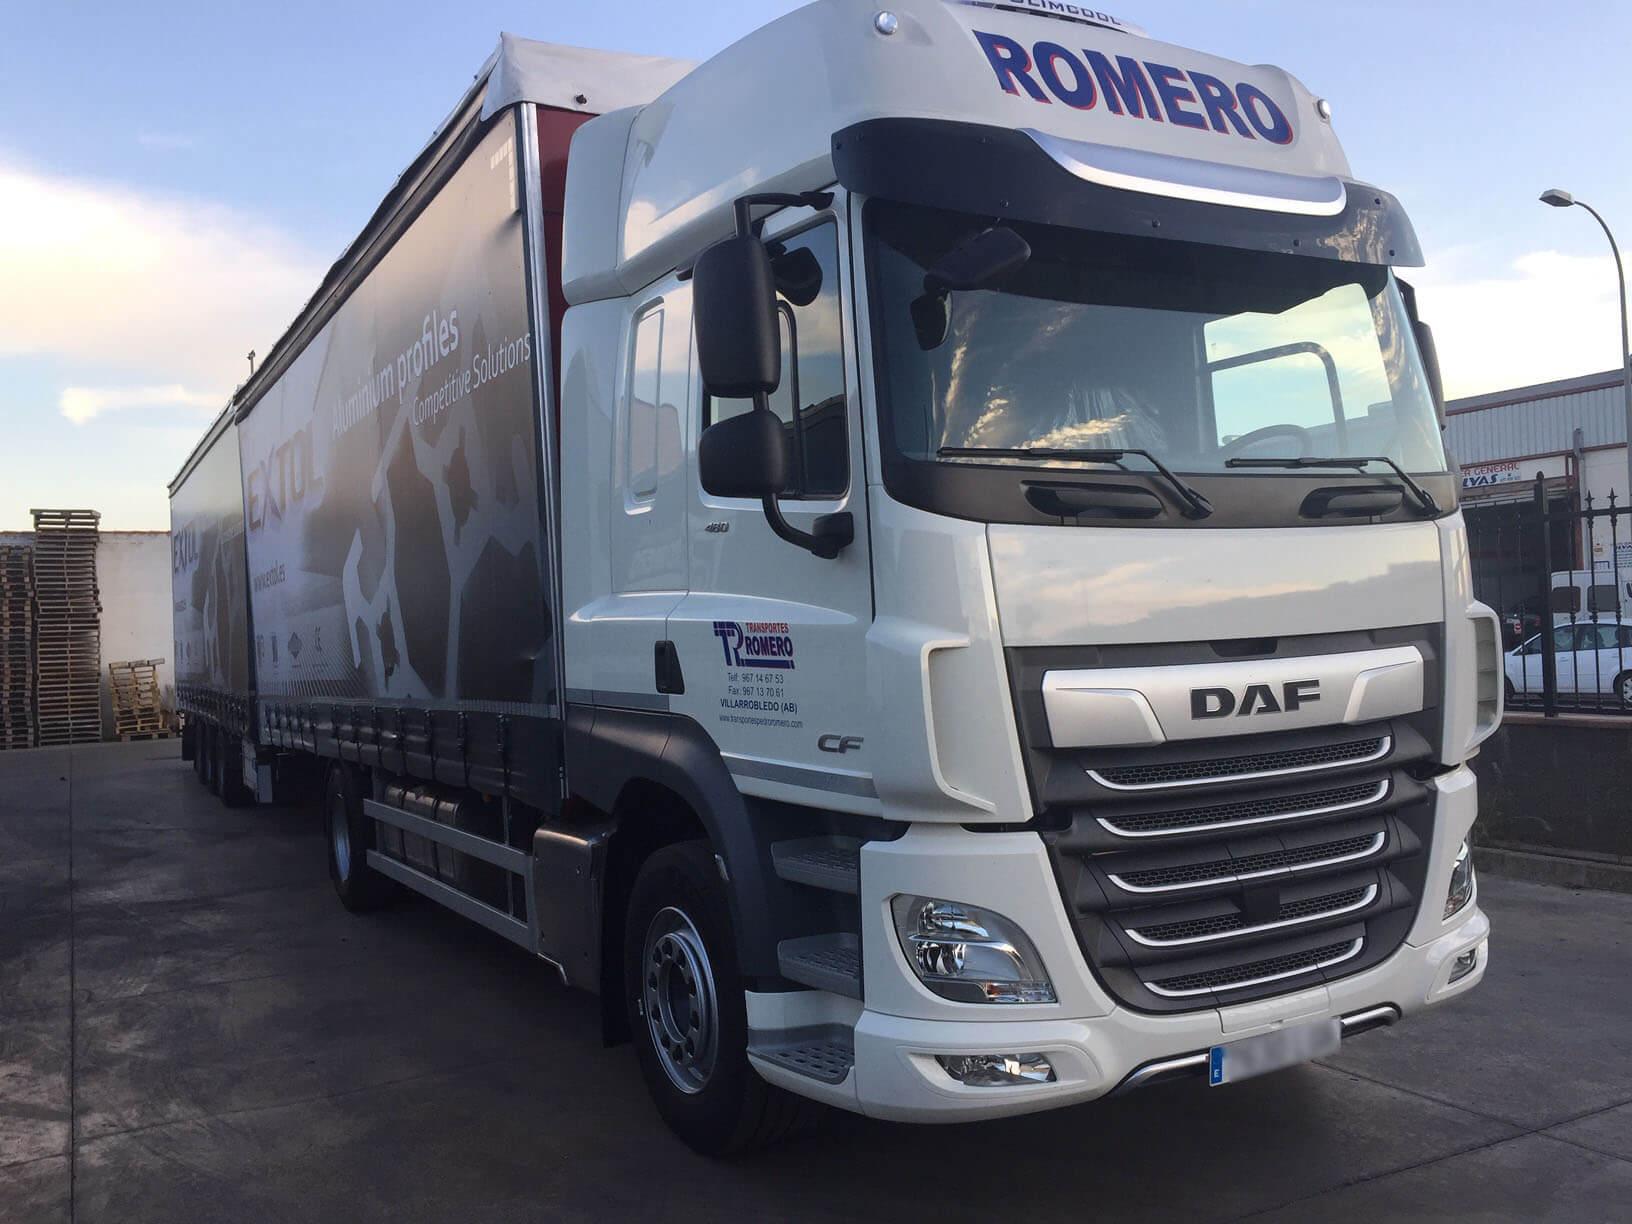 camion transportes pedro romero